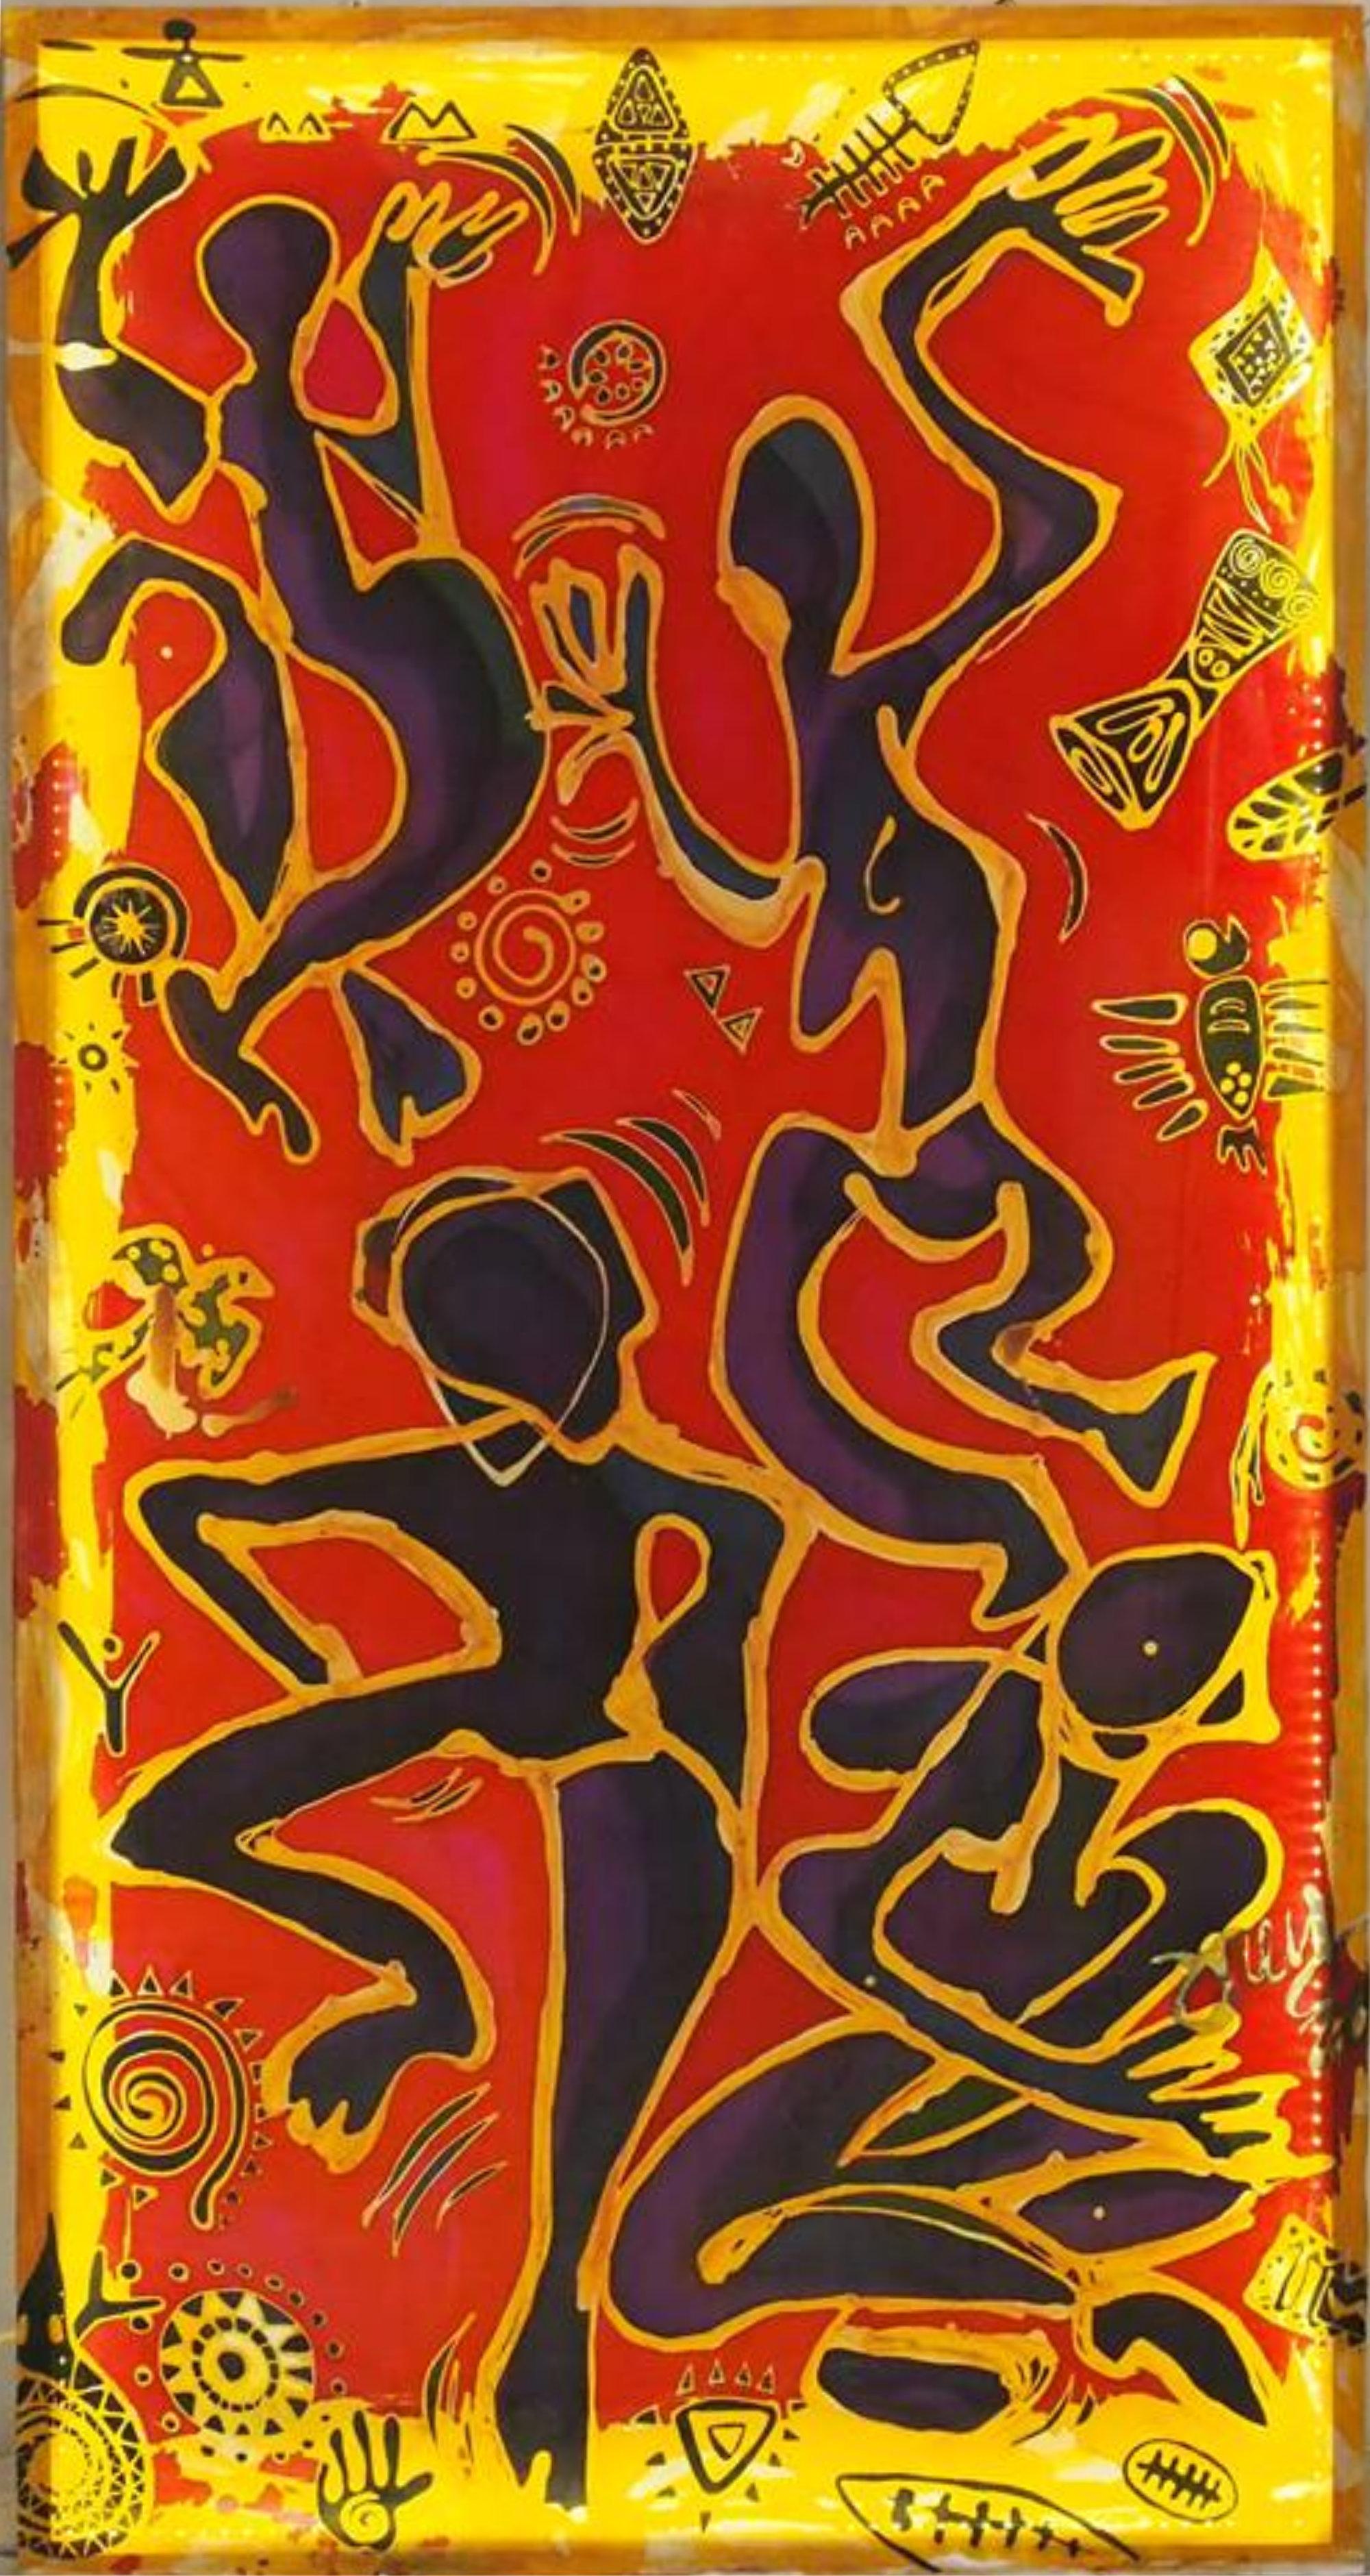 Joey Kher Batik AotuExhibition Africa Dance Artwork for Music Festival Batu Pahat Johor Malaysia Art